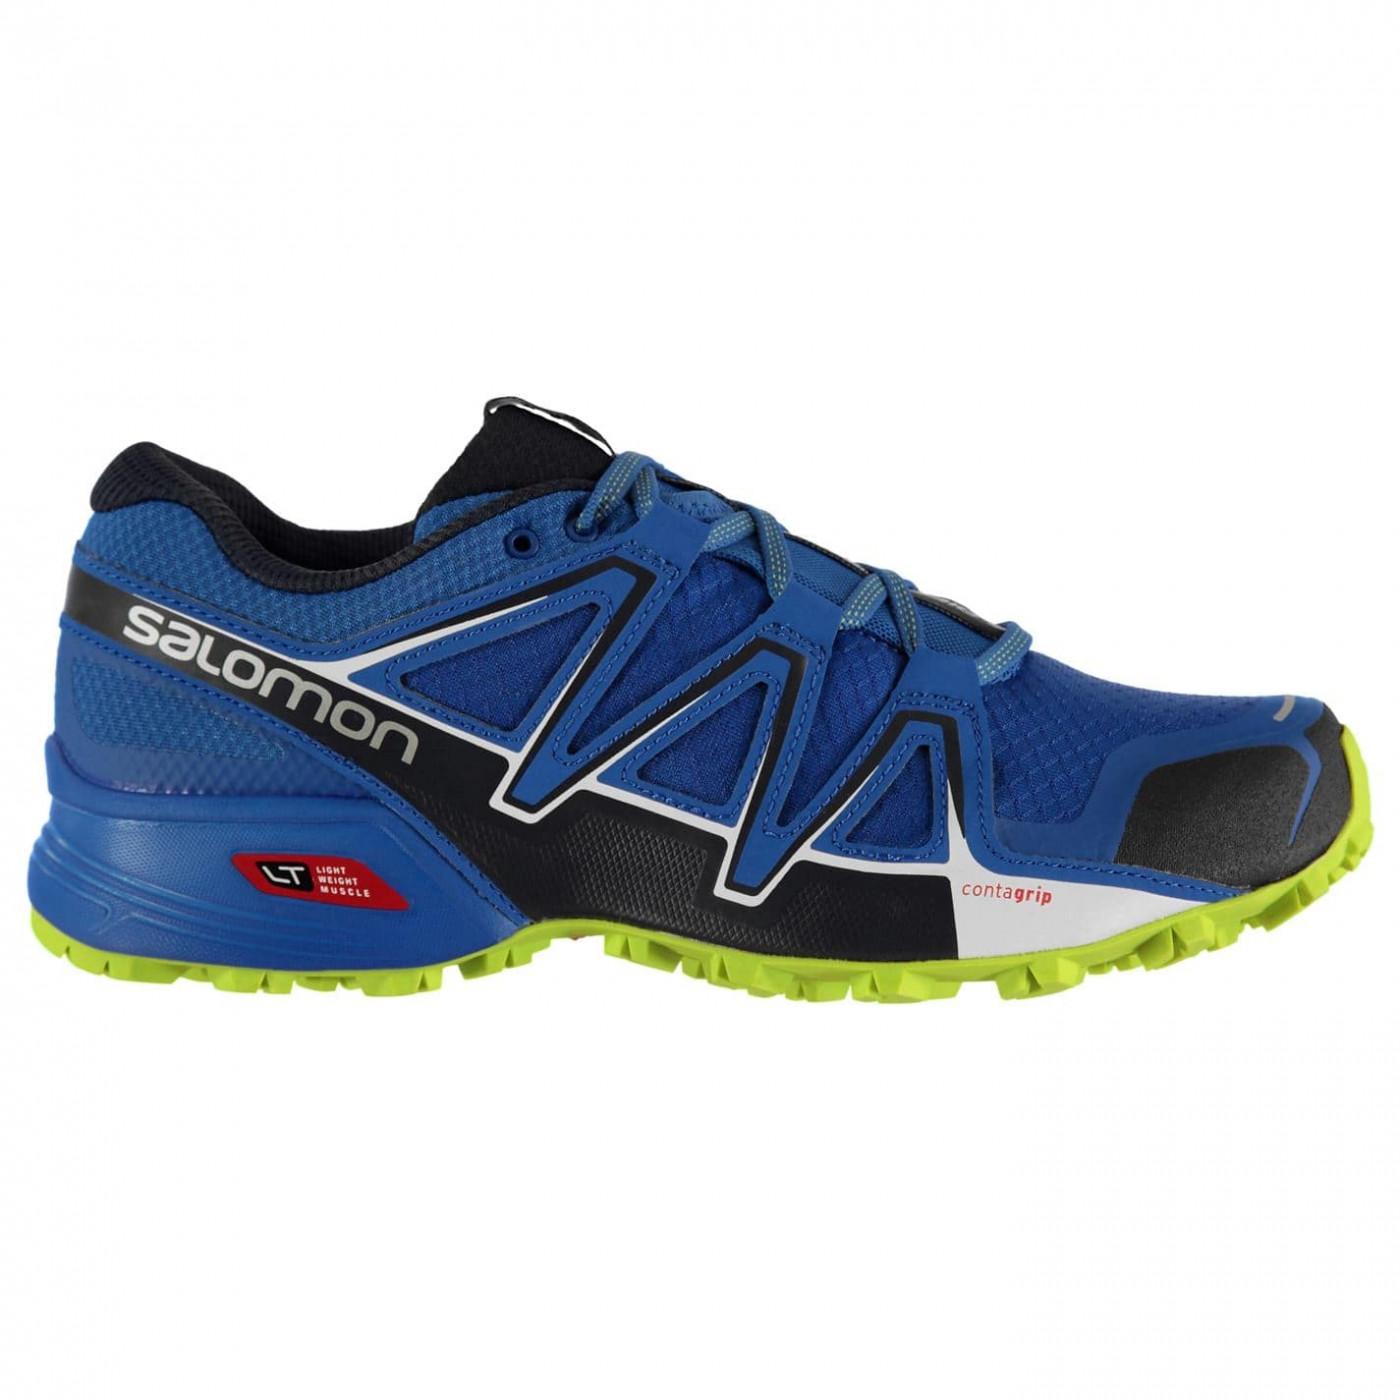 Men's running shoes Salomon Speedcross Vario 2